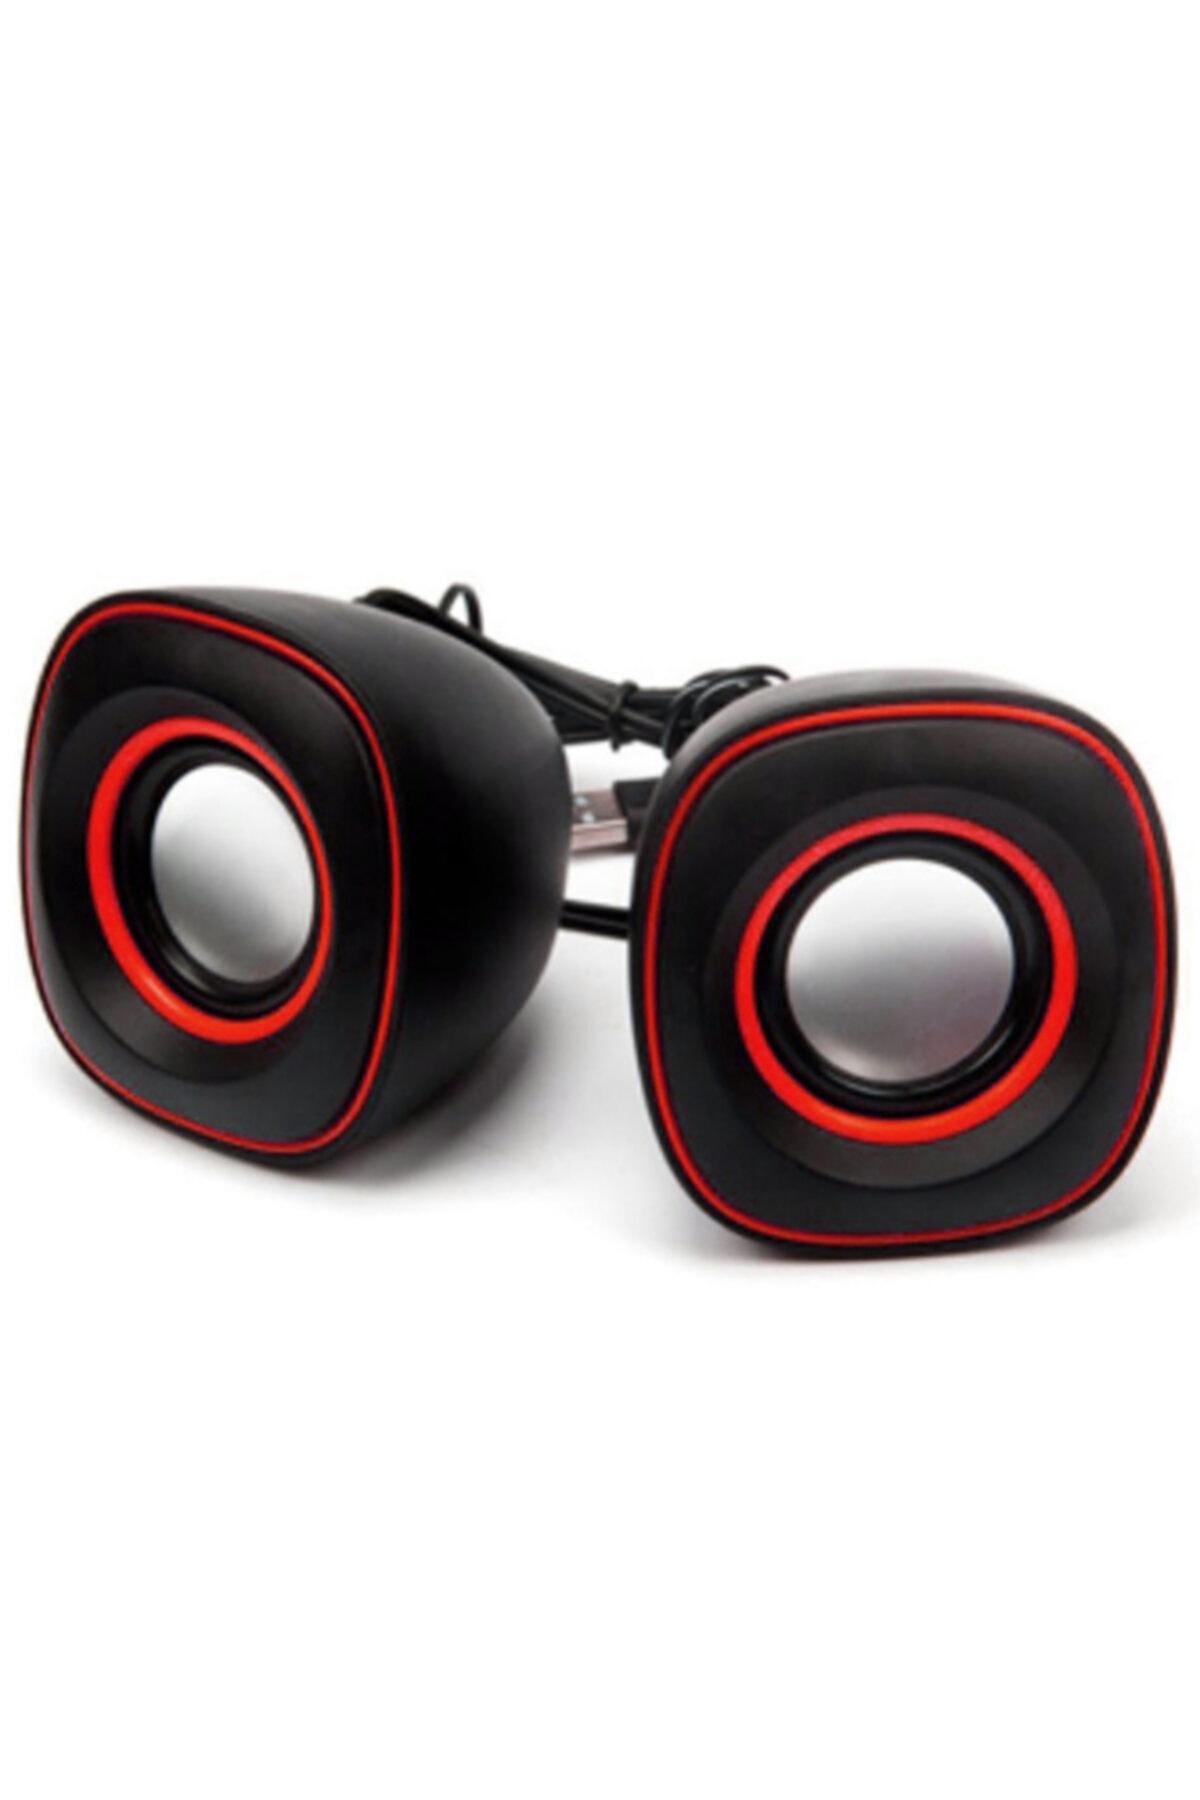 1+1 Mini Usb 2.0 Hoparlör Ses Sistemi Pc Laptop Notebook Speaker